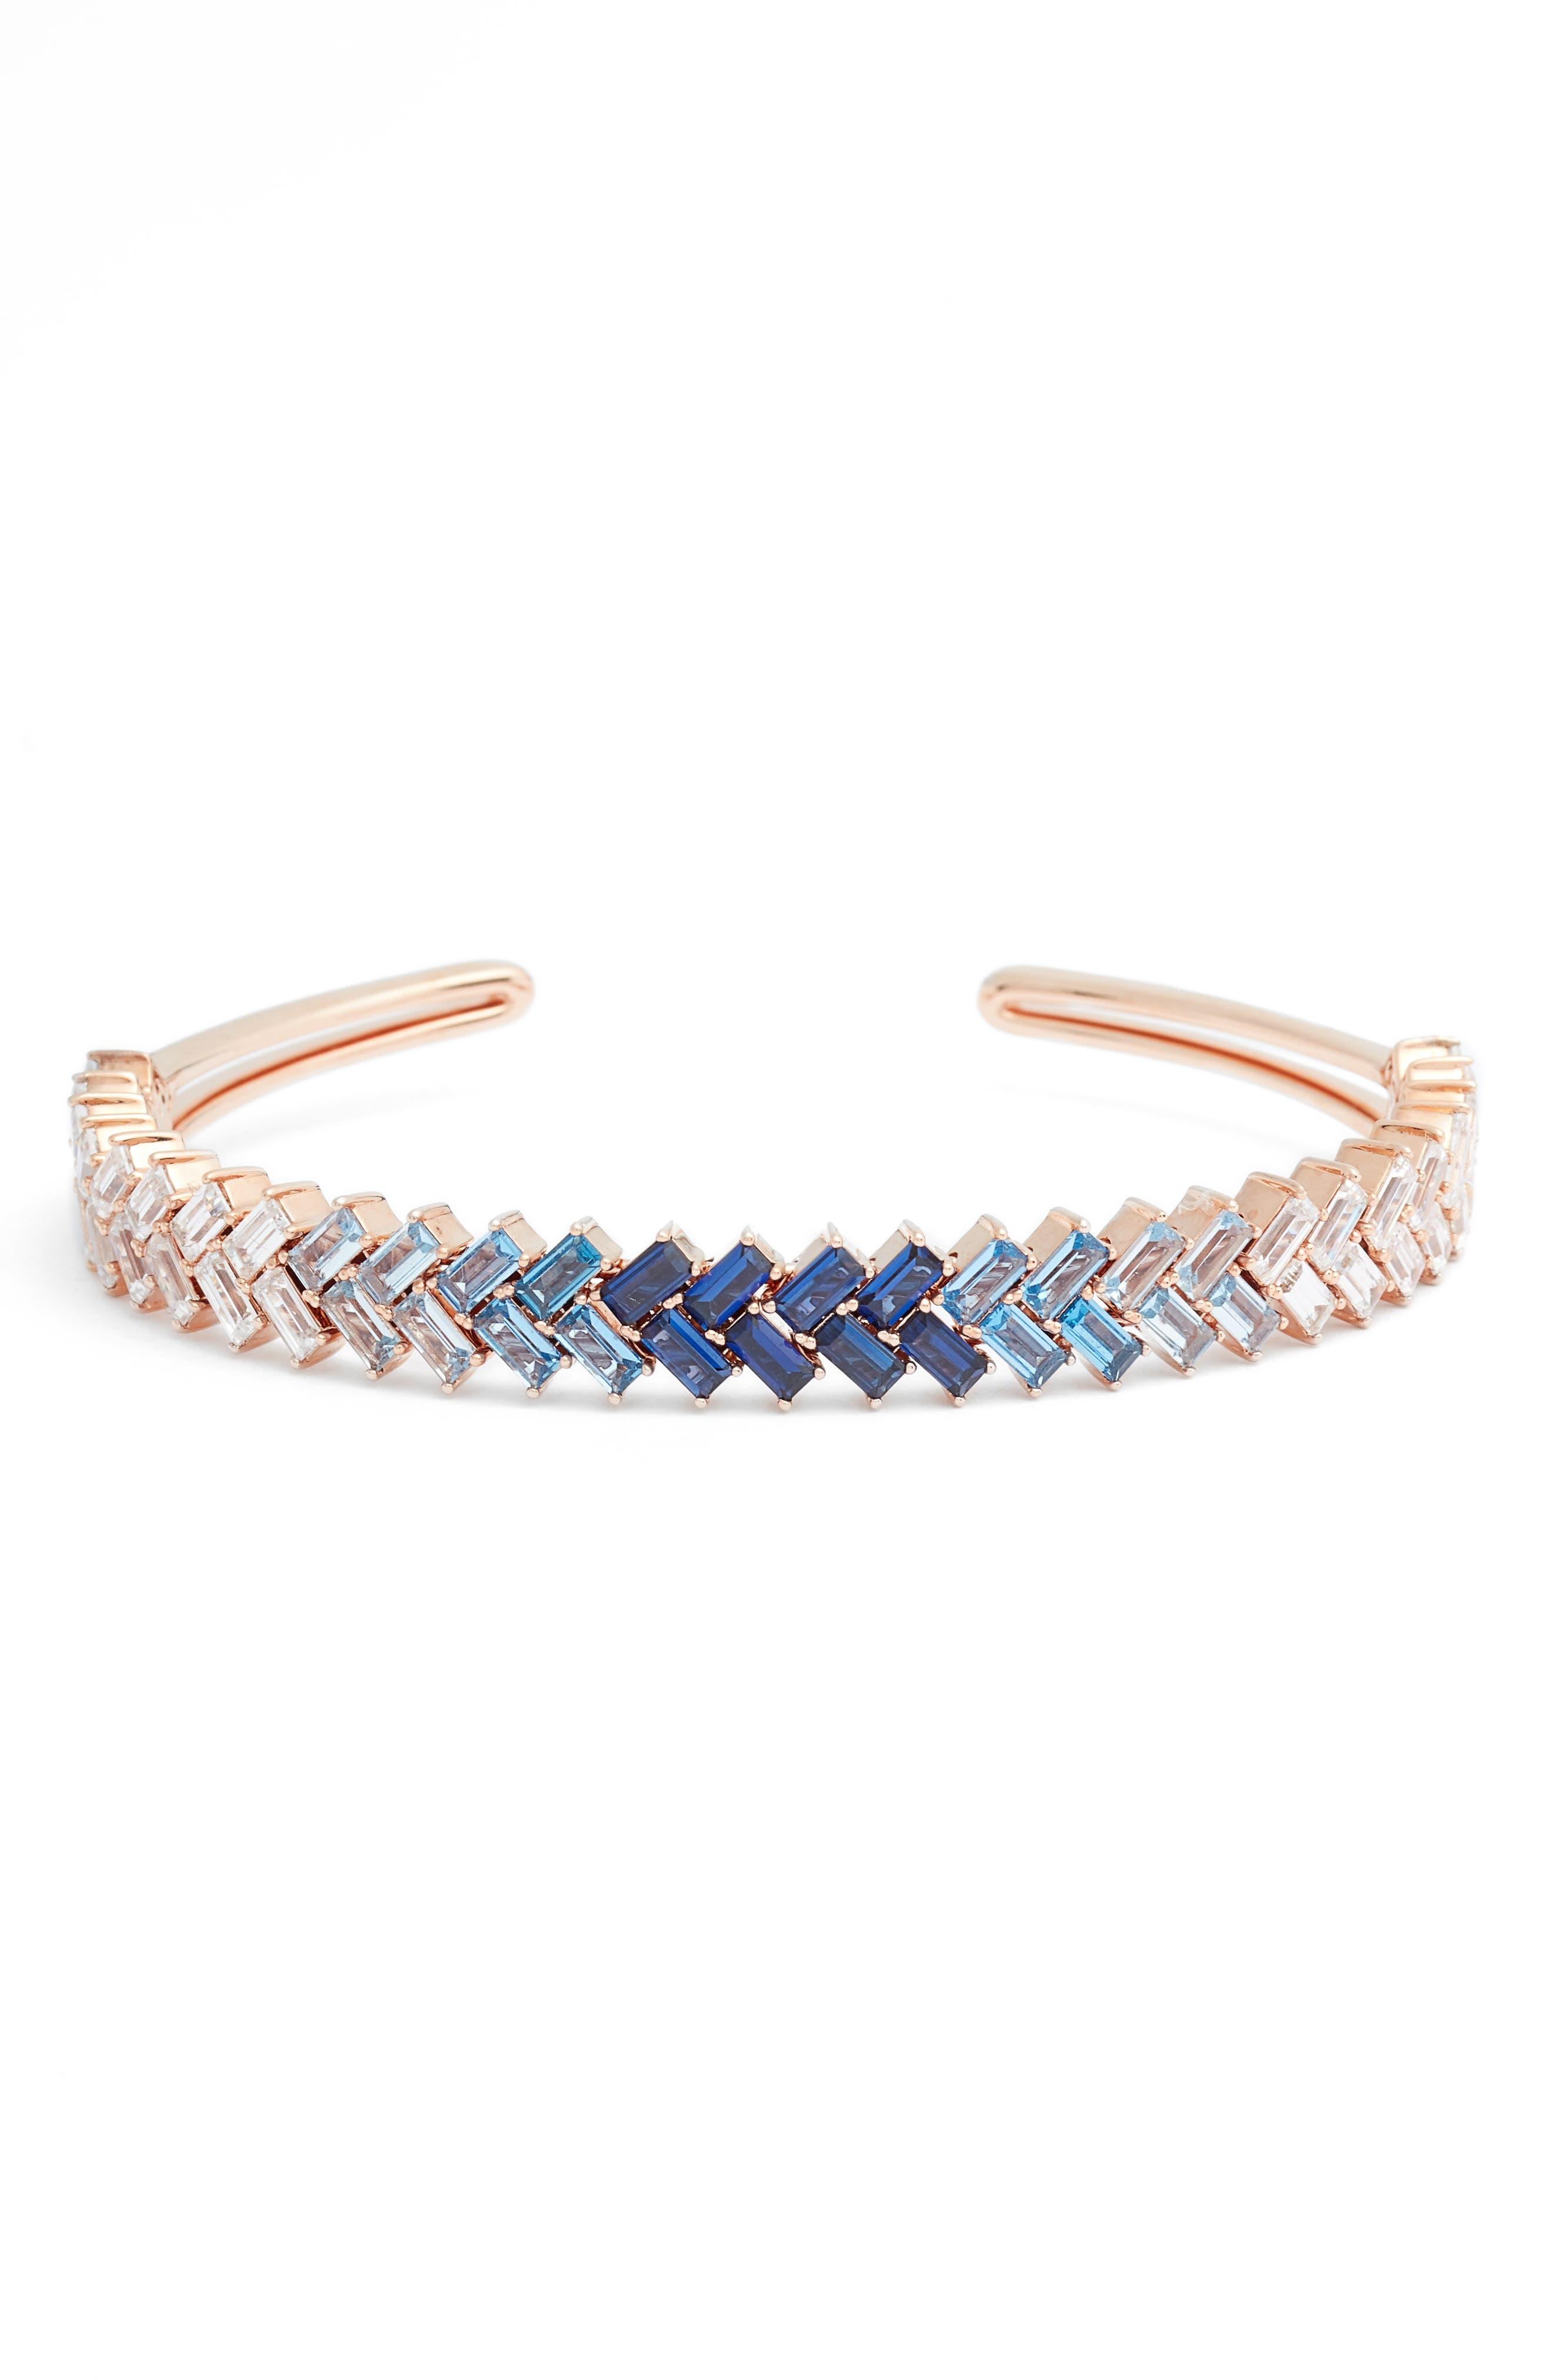 NADRI Spree Blue Baguette Cuff Bracelet in Black